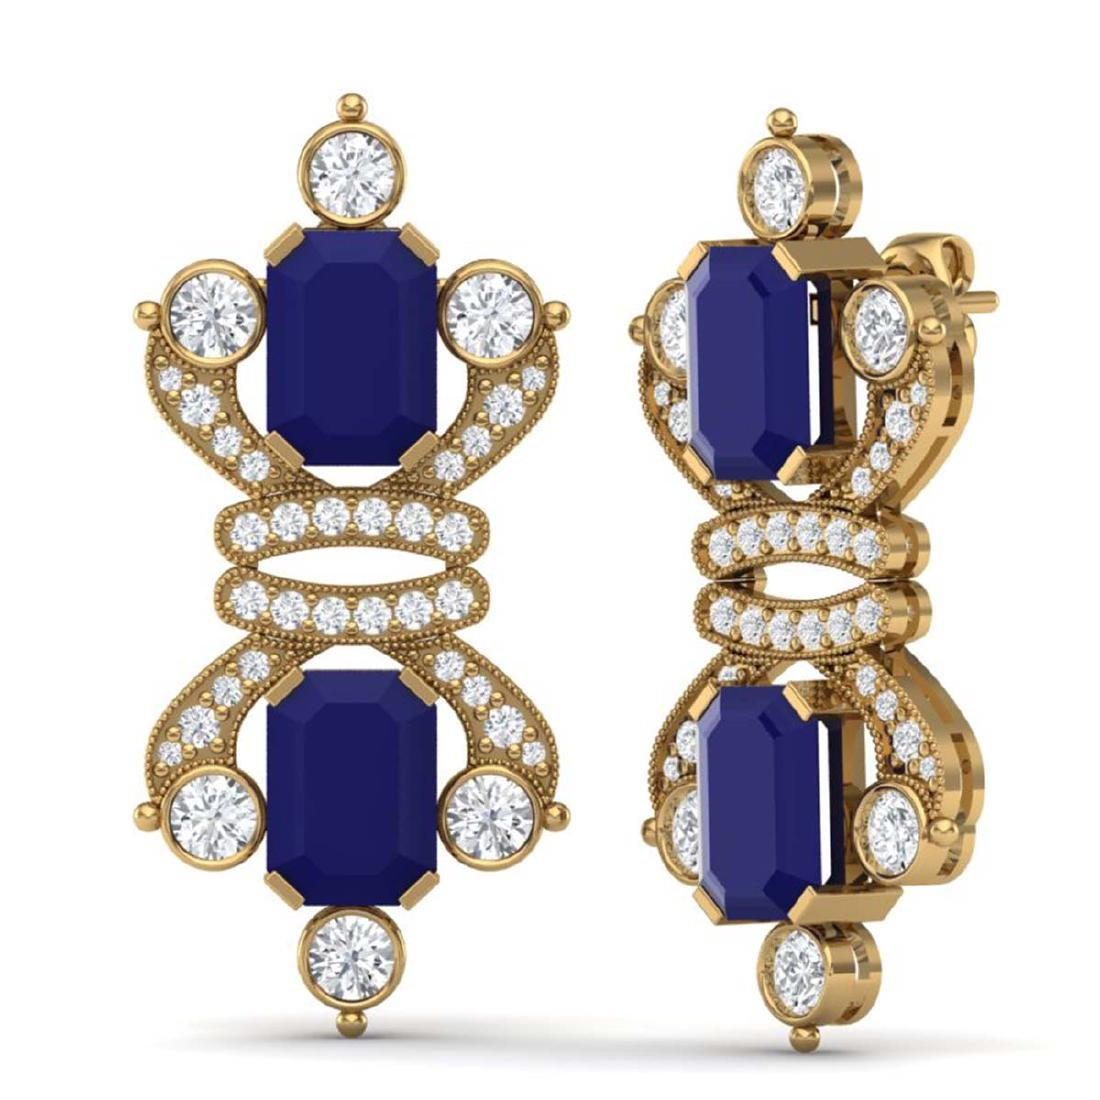 27.36 CTW Royalty Sapphire & VS Diamond Earrings 18K - 3